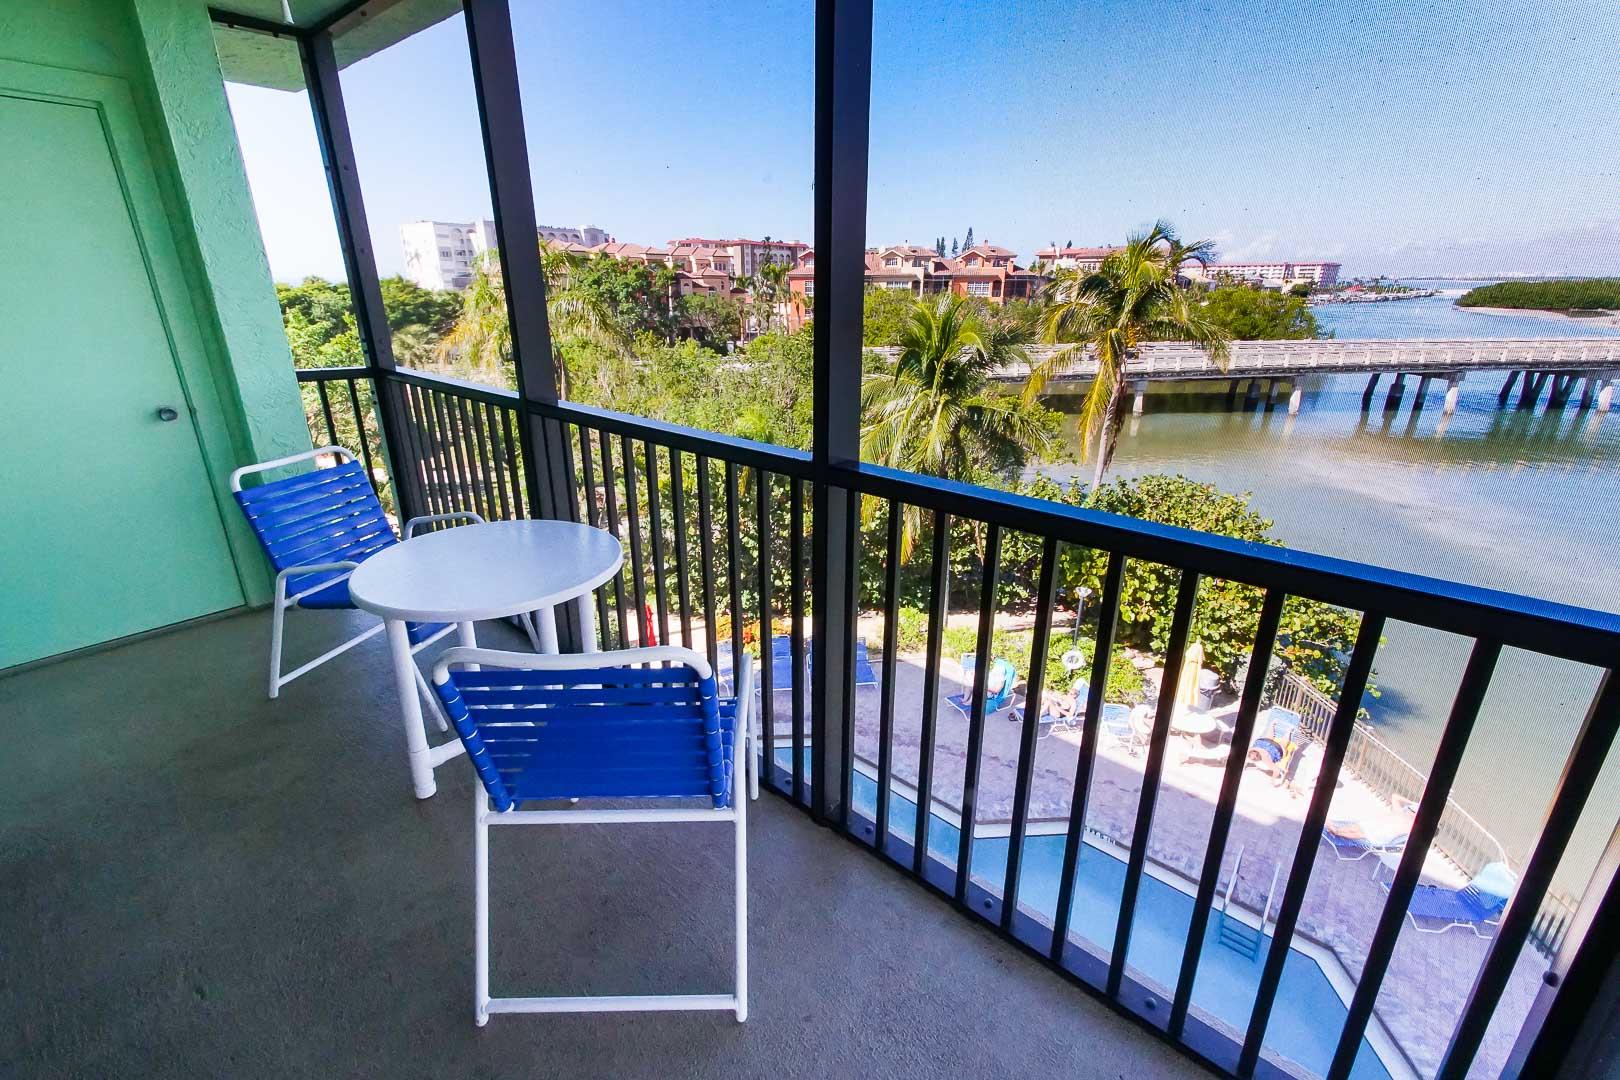 A beautiful beach front balcony at VRI's Bonita Resort and Club in Florida.